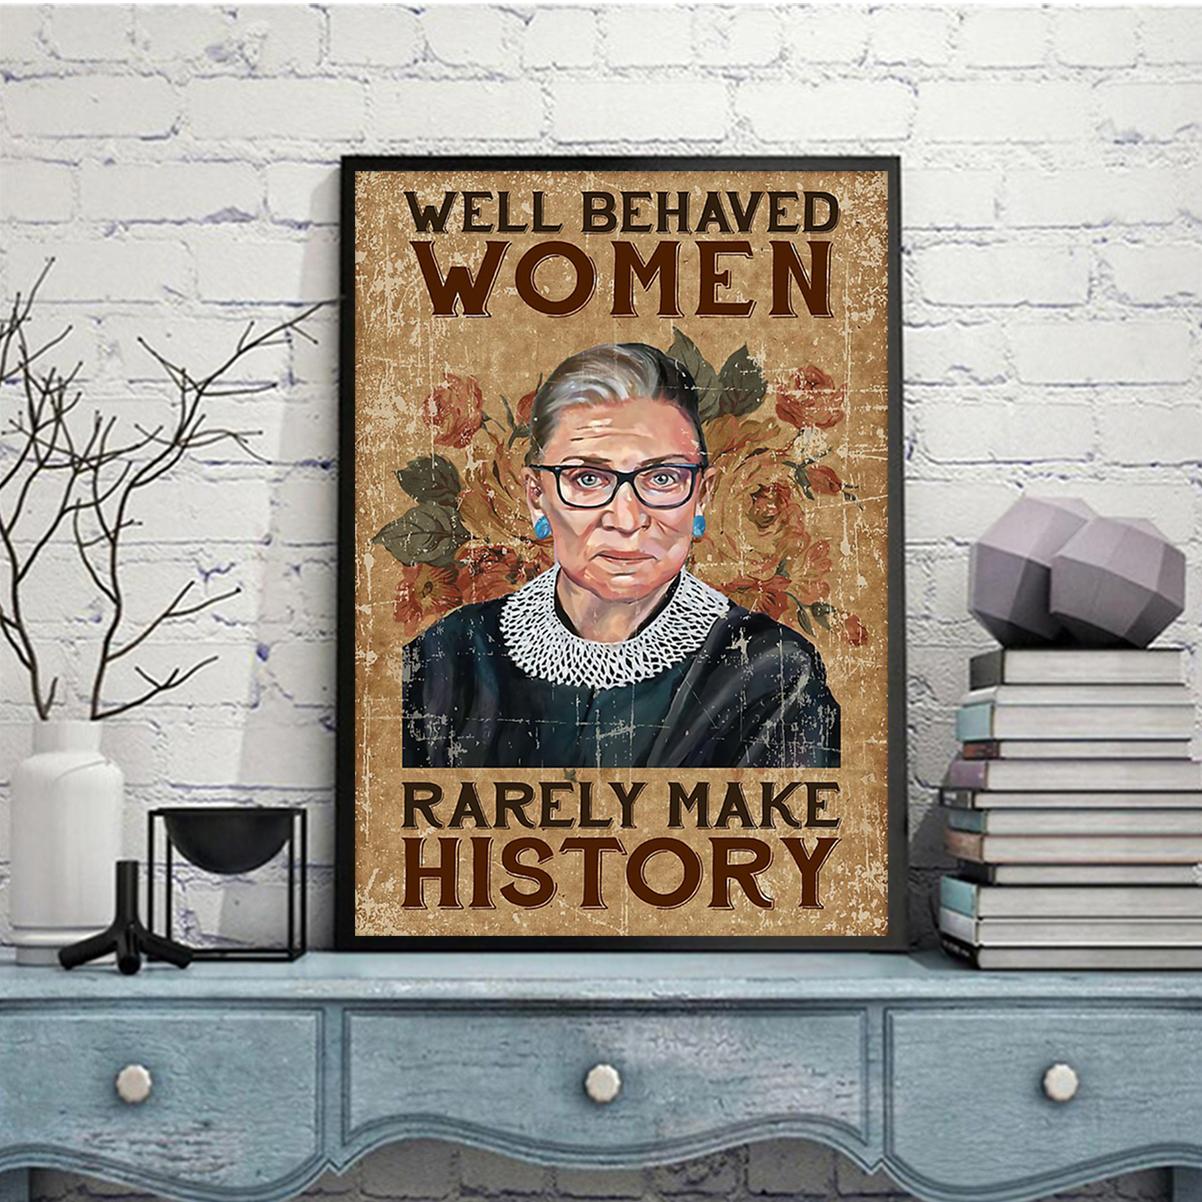 Ruth bader ginsburg well behaved woman rarely make history poster A2